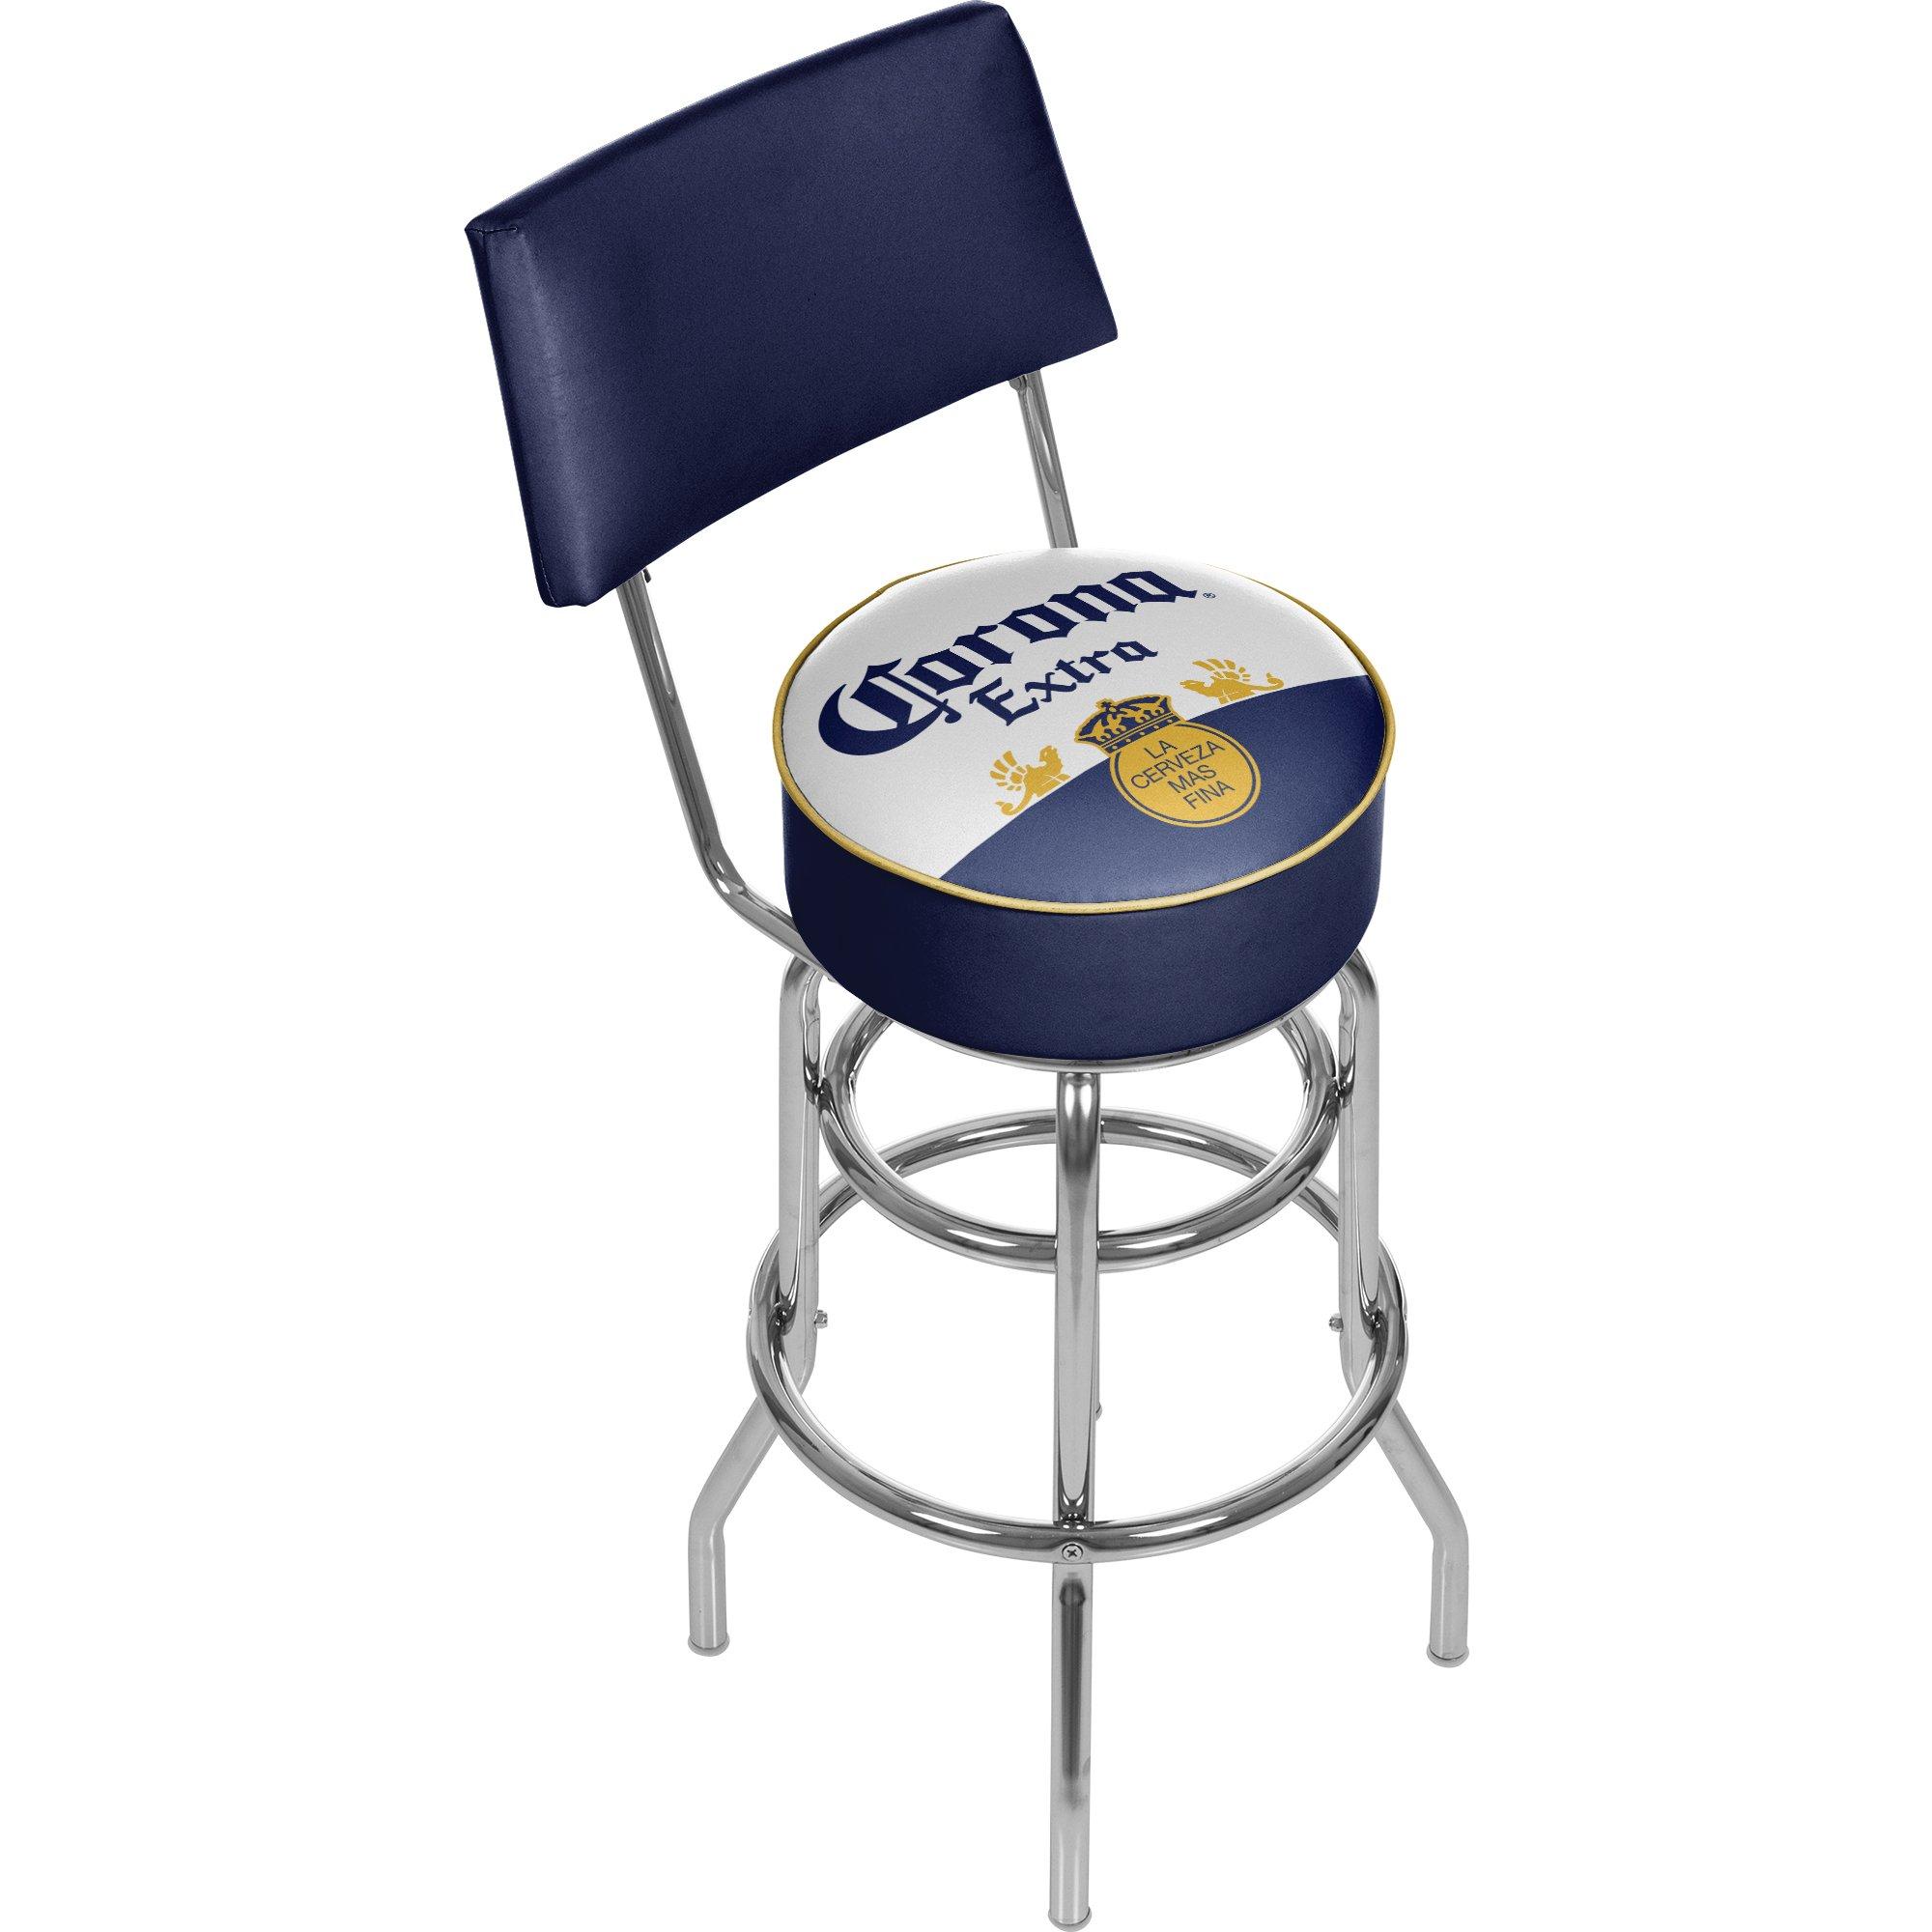 Corona Extra Swivel Padded Swivel Bar Stool with Back - Label Design - by Corona